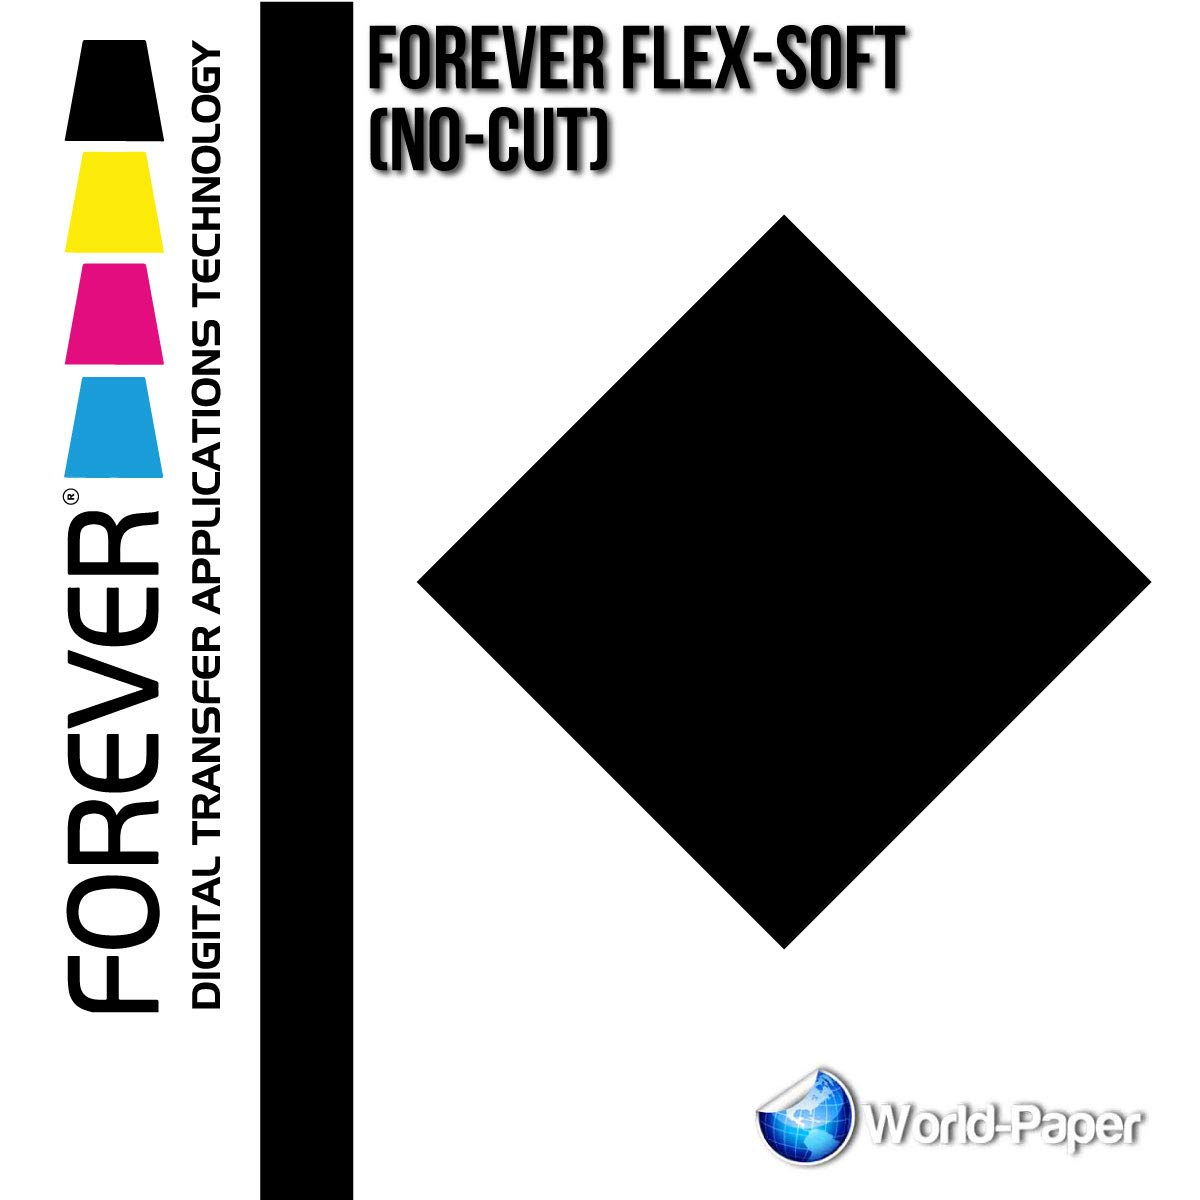 Forever Flex-Soft (No-Cut) Laser/LED Heat Transfer Paper 10 Sheets 8.5''x11'' 11''x17'' (11''x17'', Black)